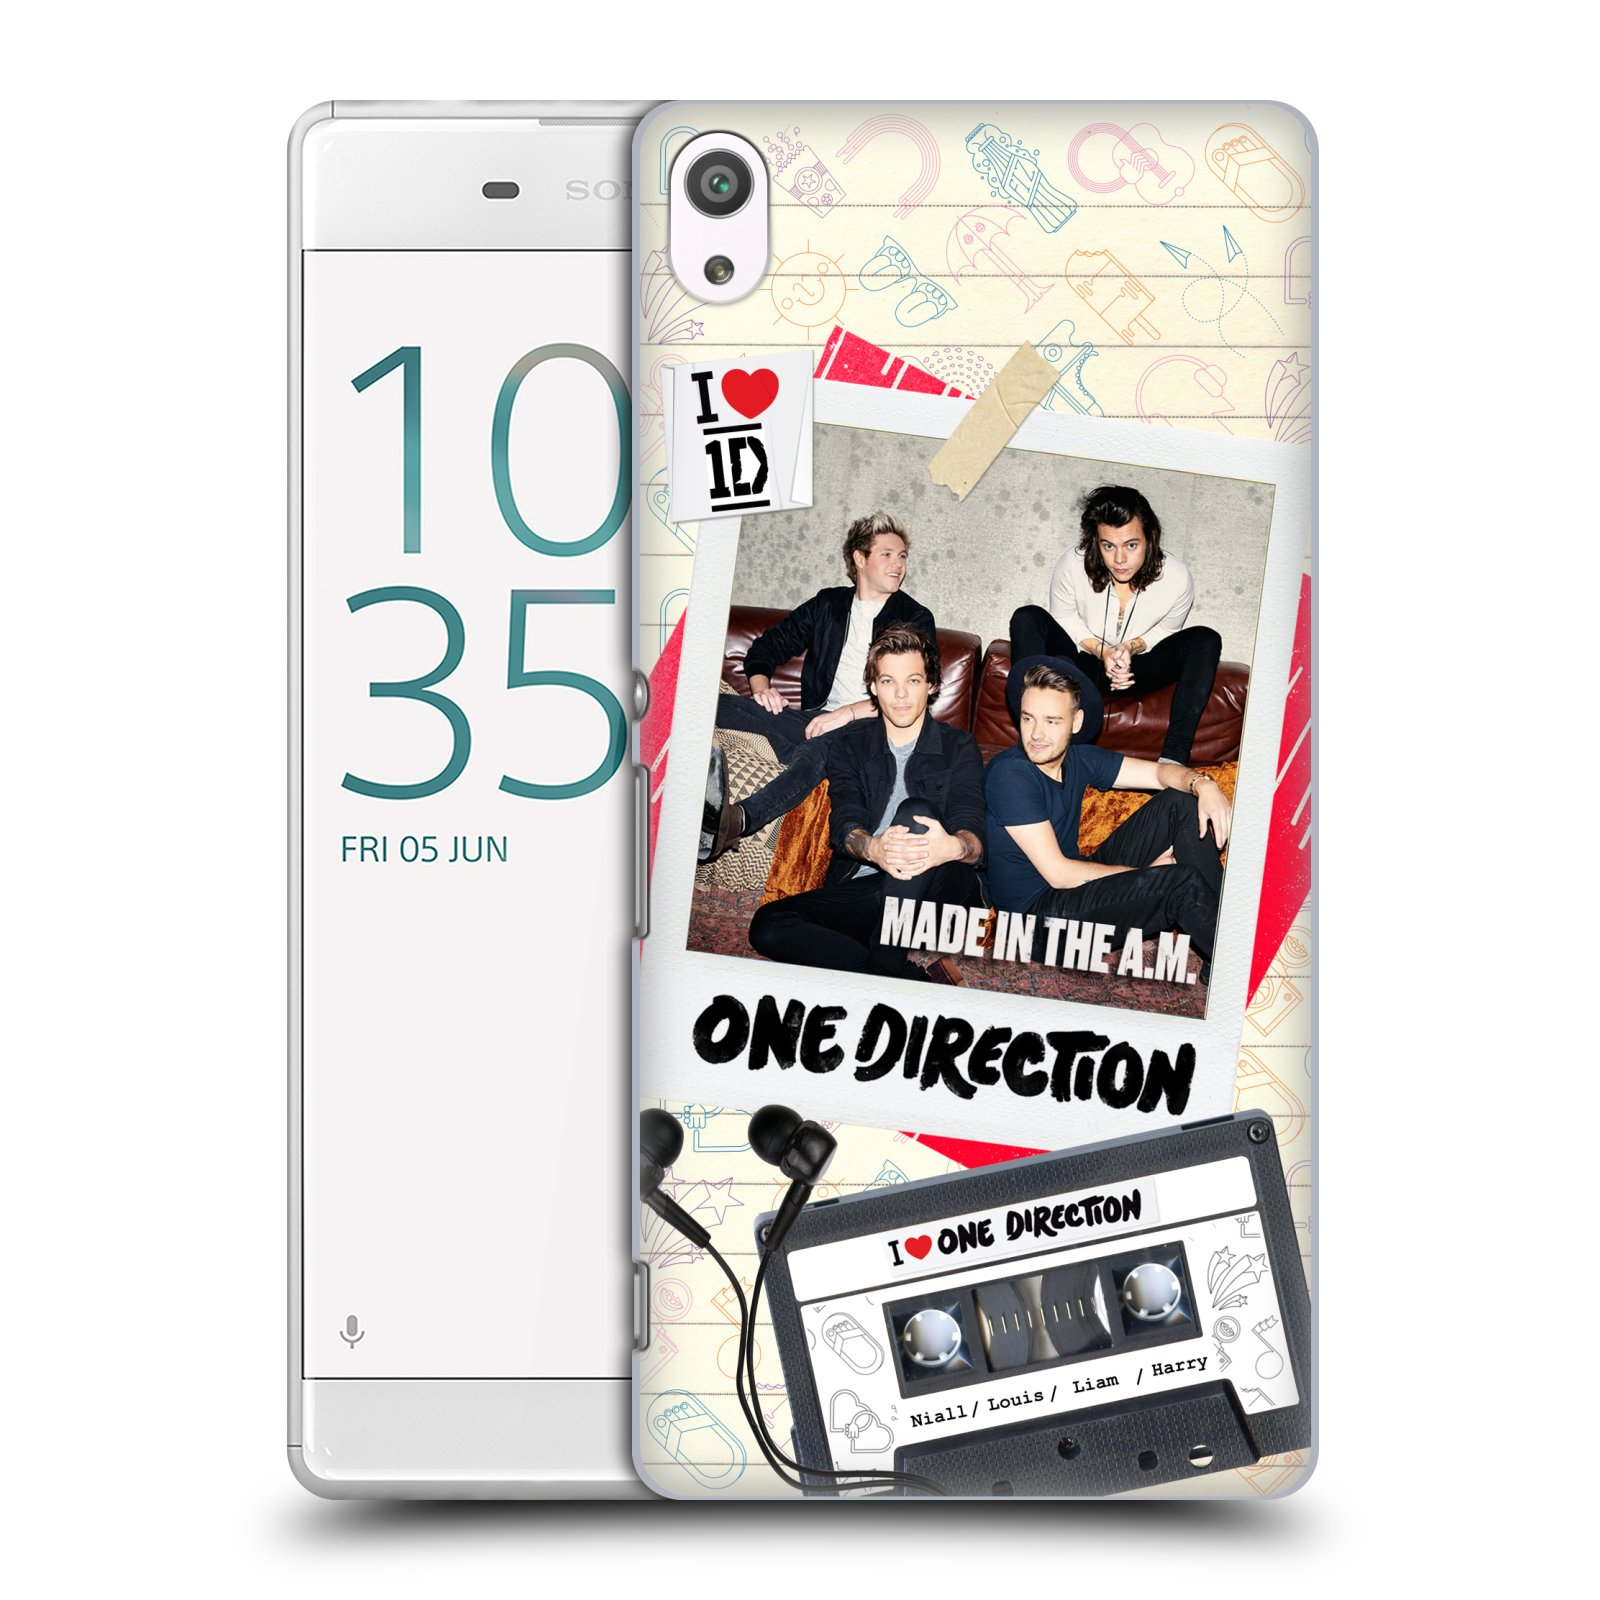 Plastové pouzdro na mobil Sony Xperia XA Ultra HEAD CASE One Direction - Kazeta (Plastový kryt či obal One Direction Official na mobilní telefon Sony Xperia XA Ultra F3211)